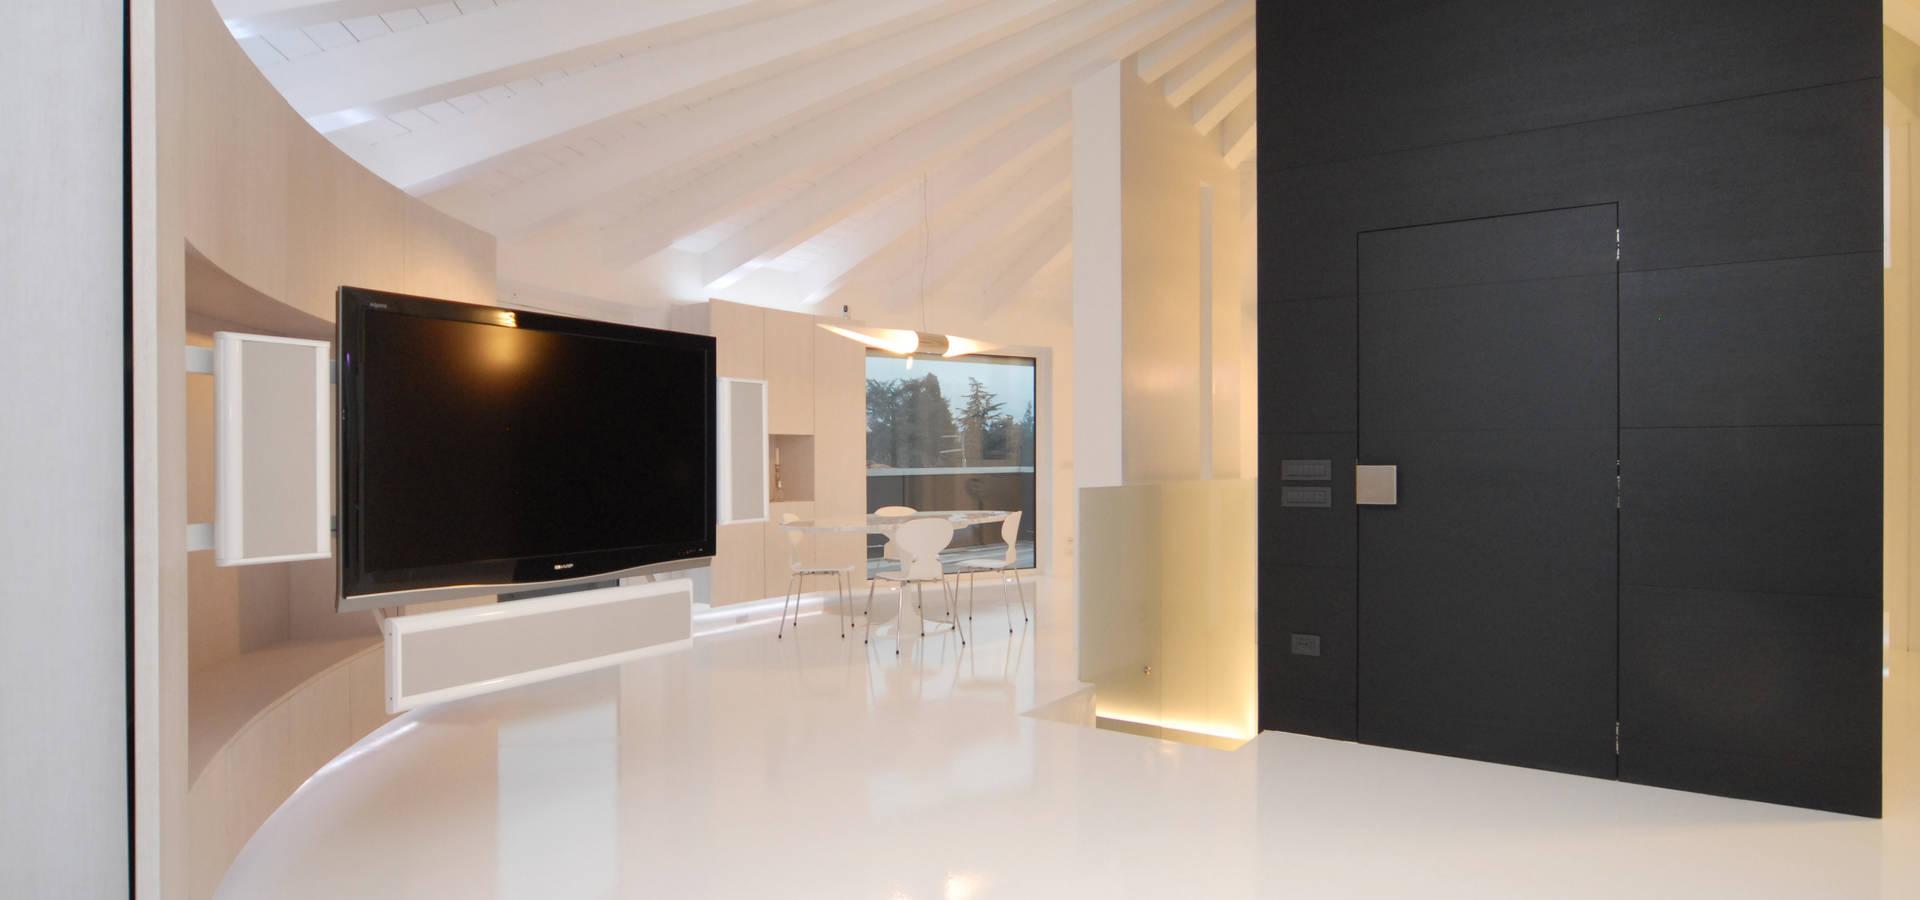 Carlo Beltramelli Interior Designer